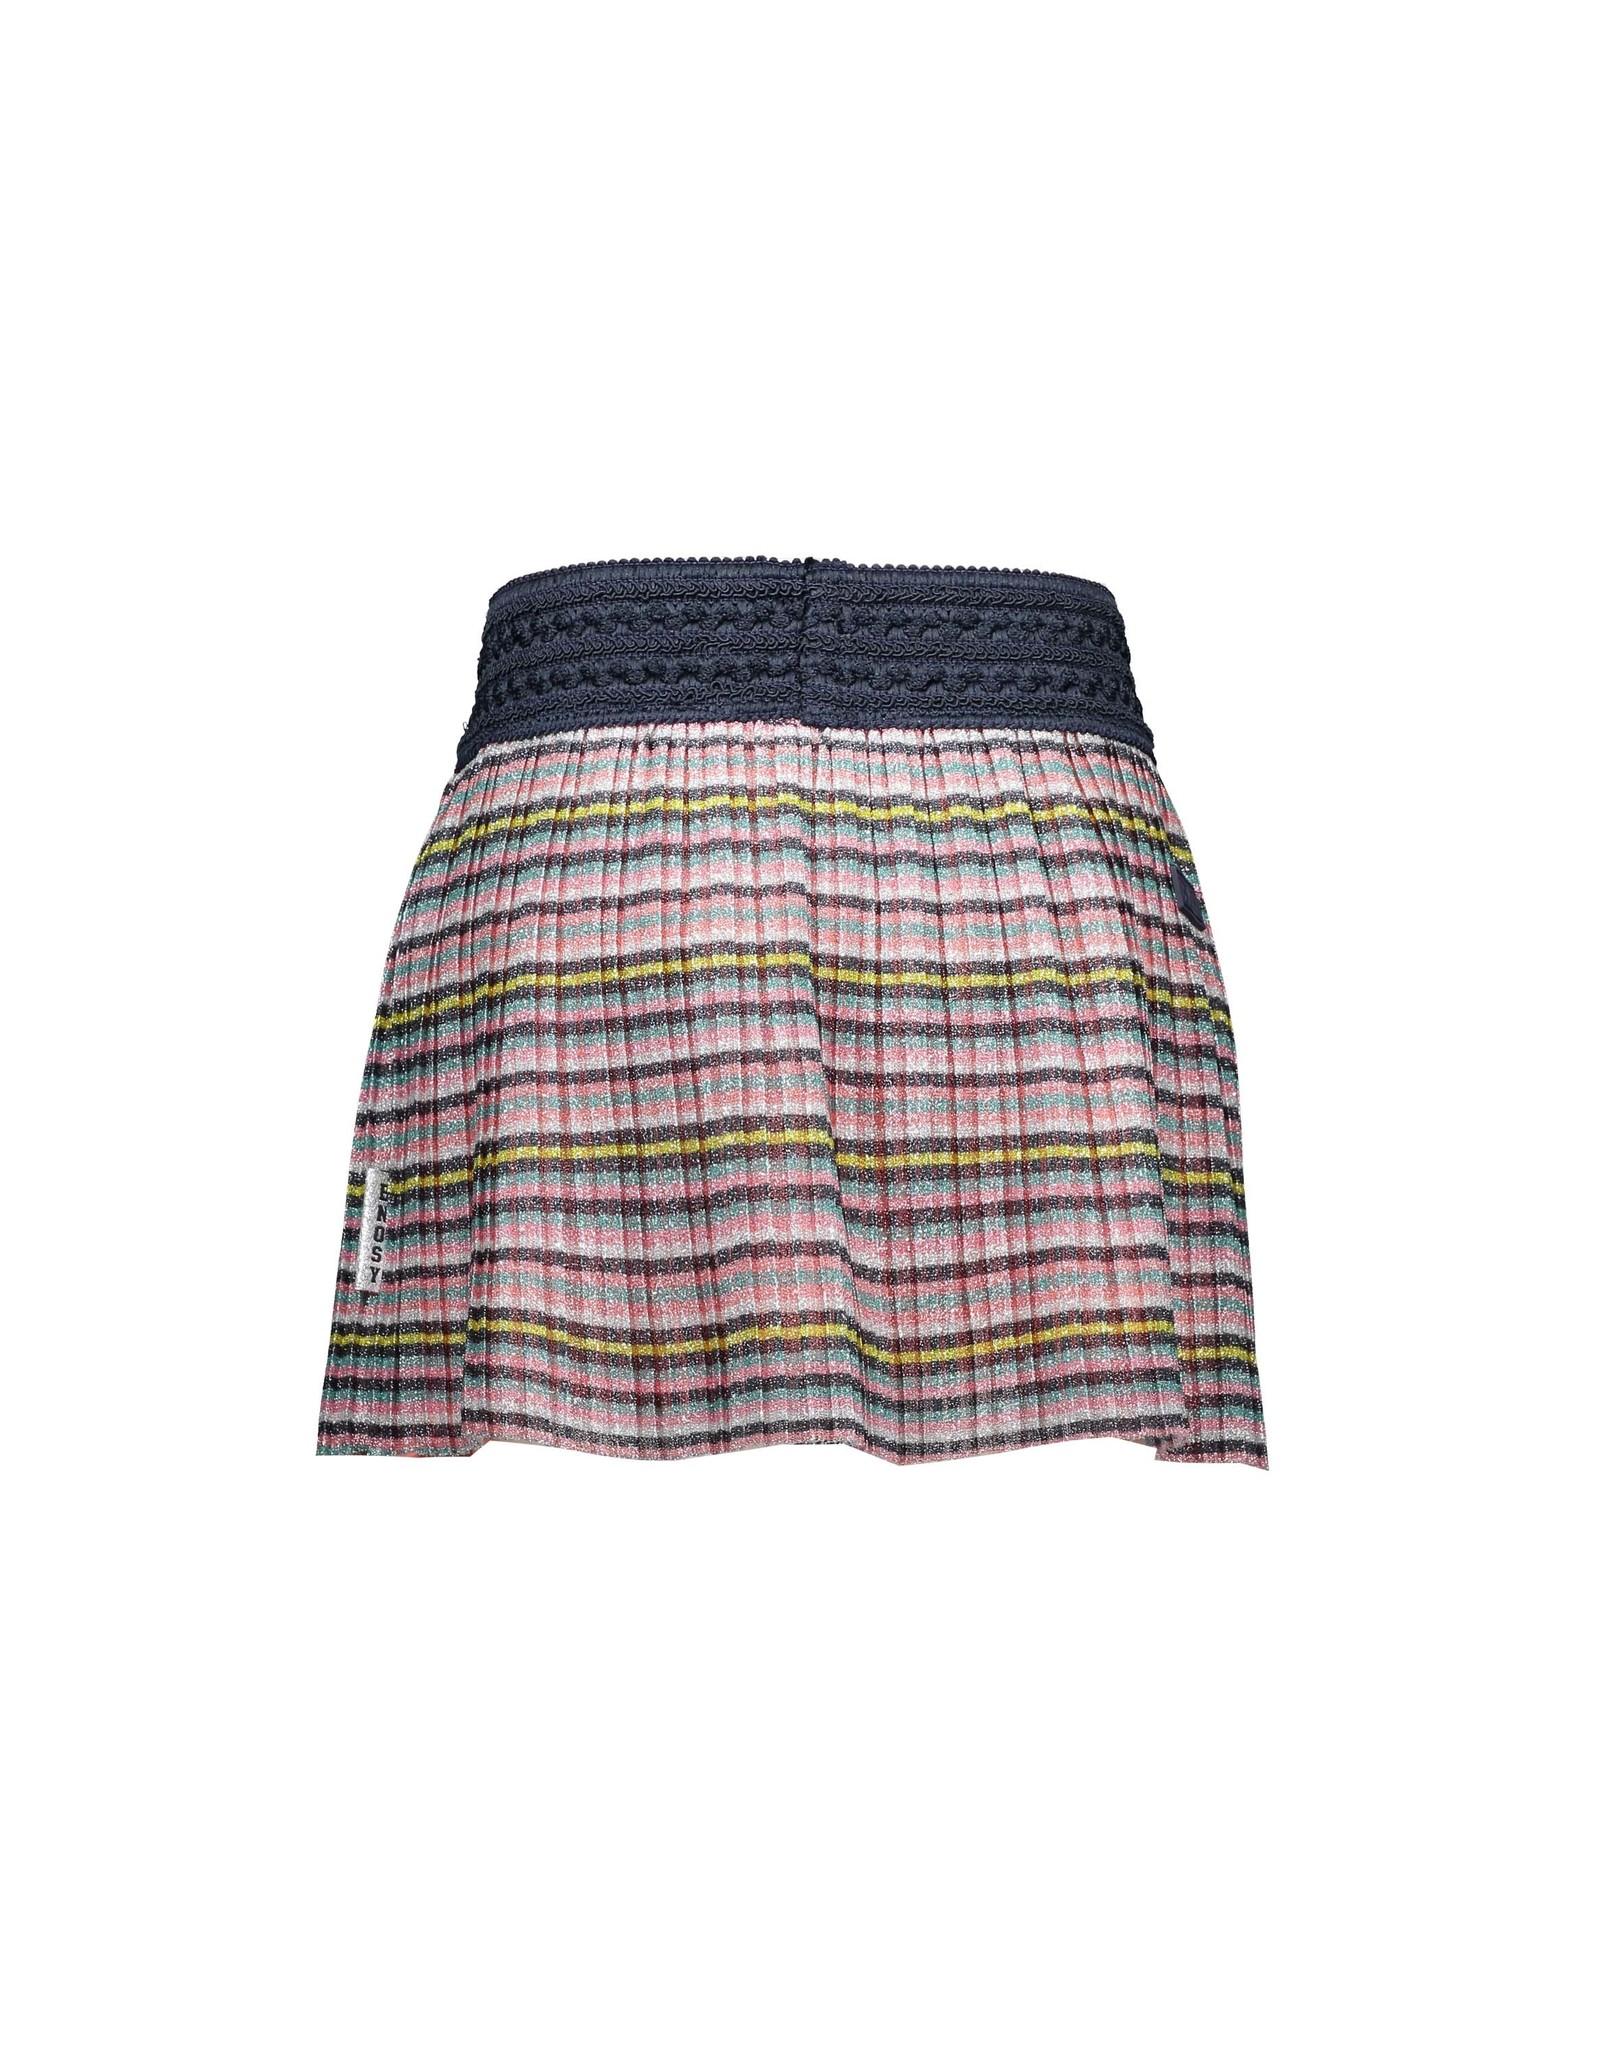 "B.Nosy B.Nosy-Girls Multi Color Plissé Skirt-""MultiStripeGlitter"""